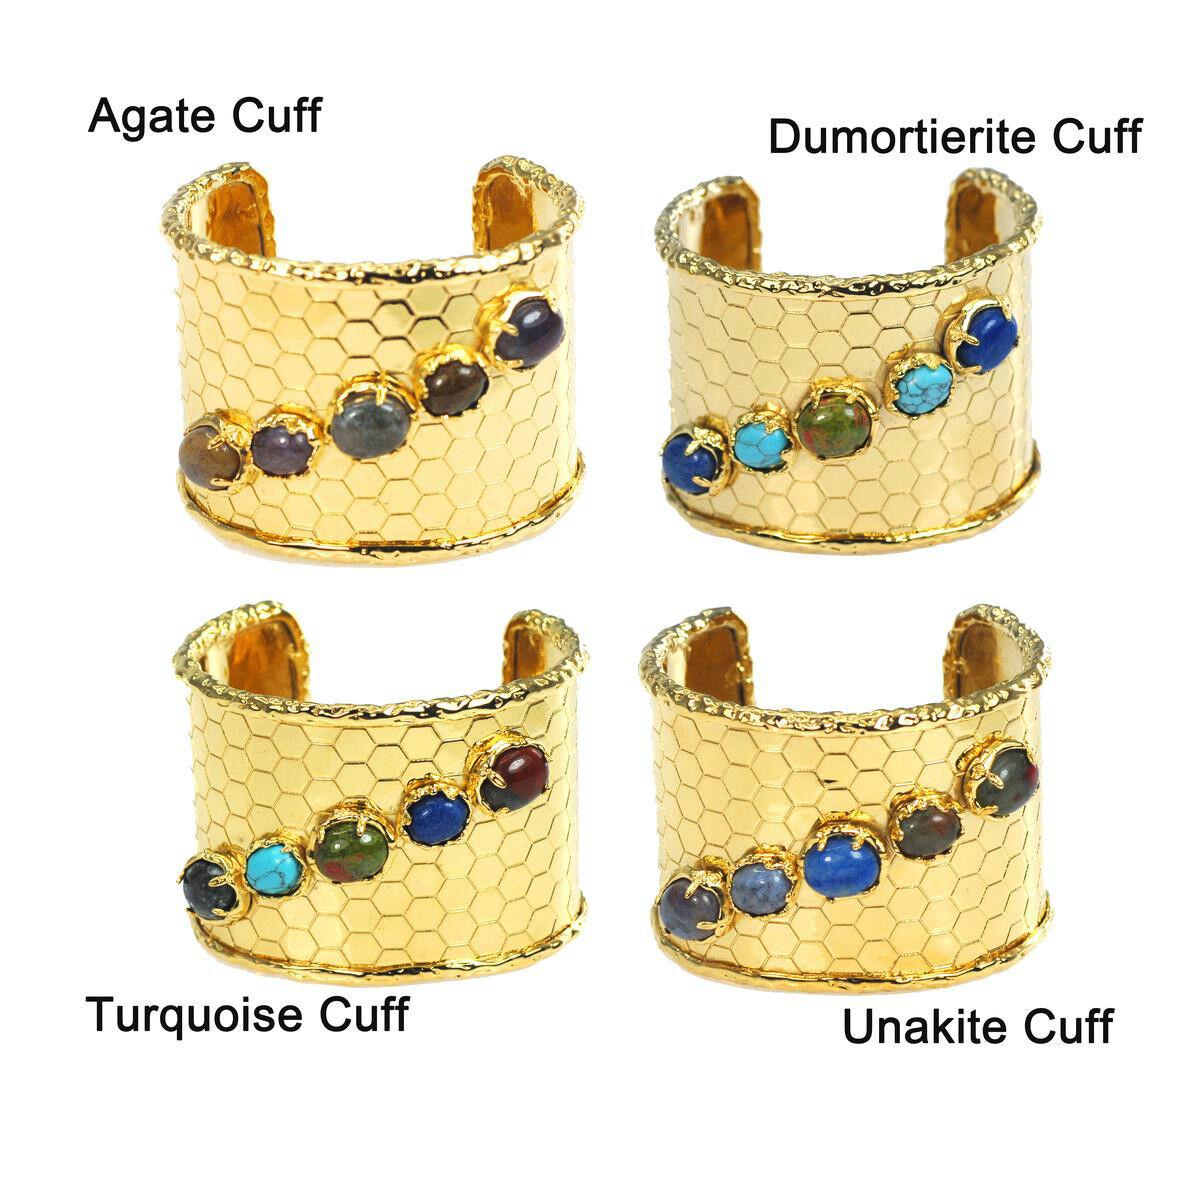 De Buman 14k gold Overlay Agate, Turquoise, Unakite or Dumortierite Bracelet